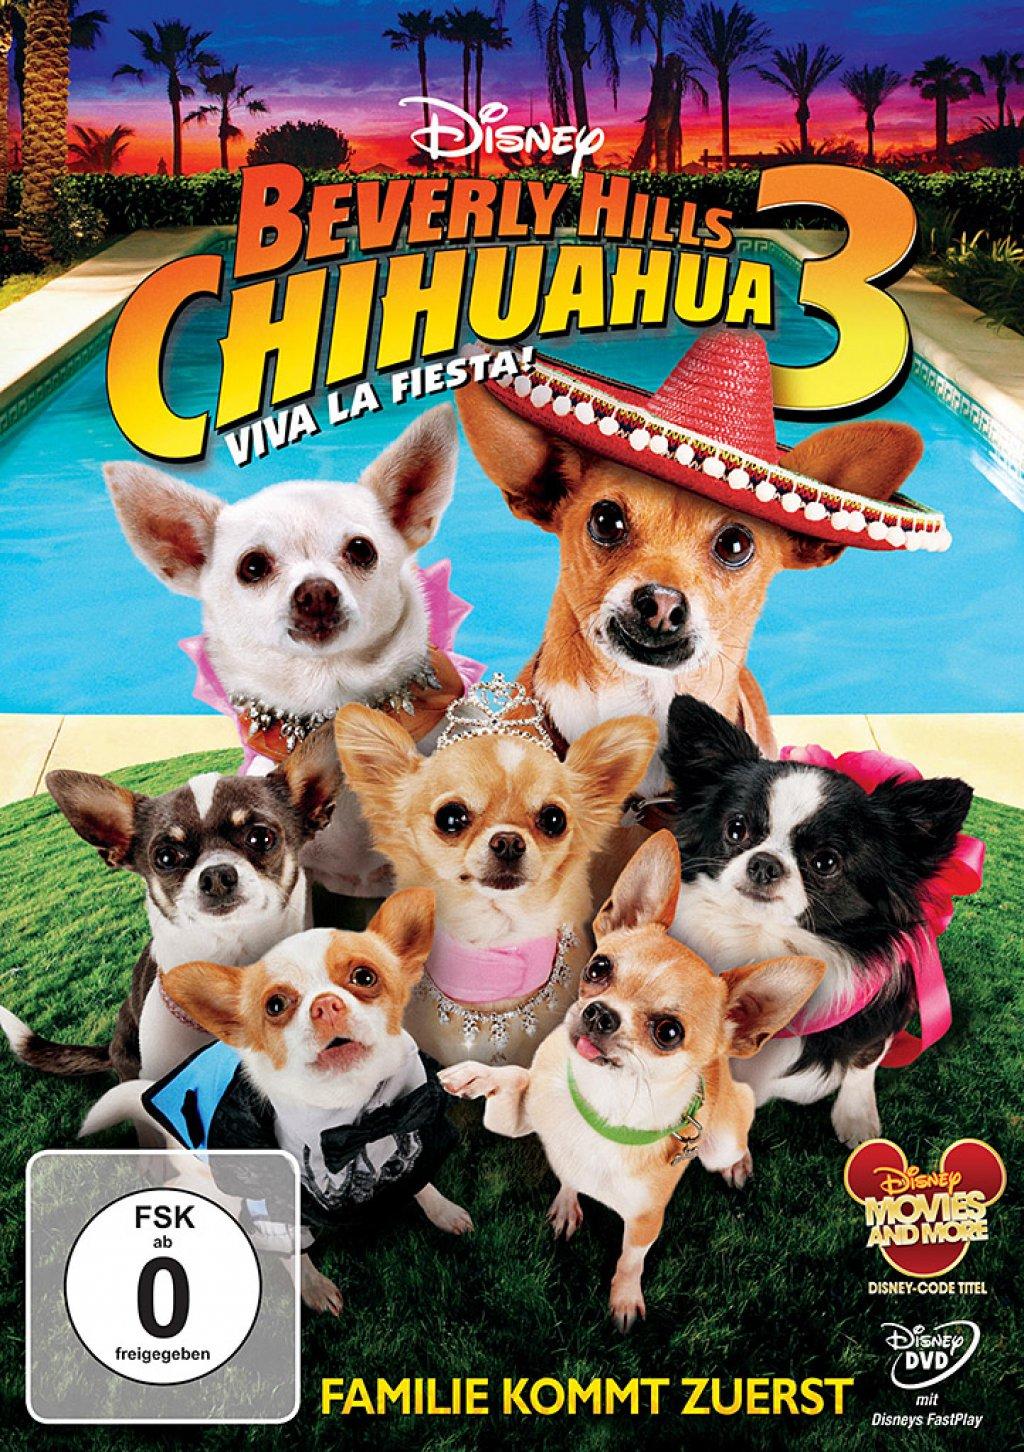 Beverly Hills Chihuahua 3 - Viva la Fiesta! (DVD)